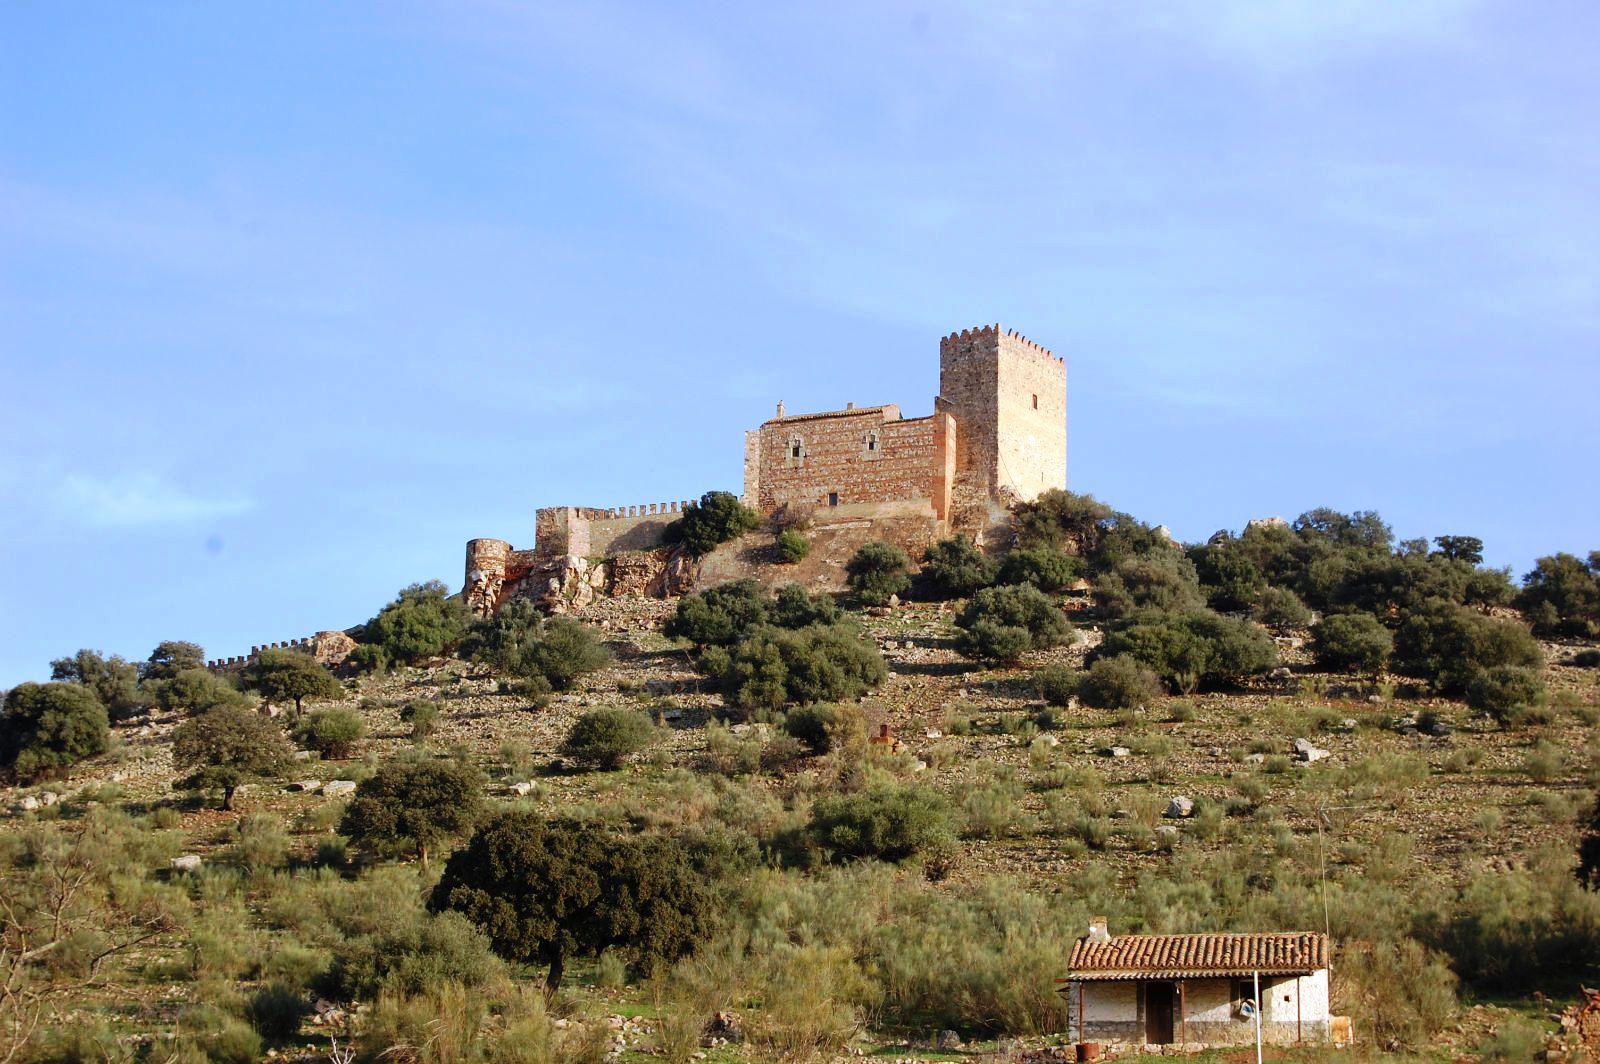 Castillo el Madroñiz